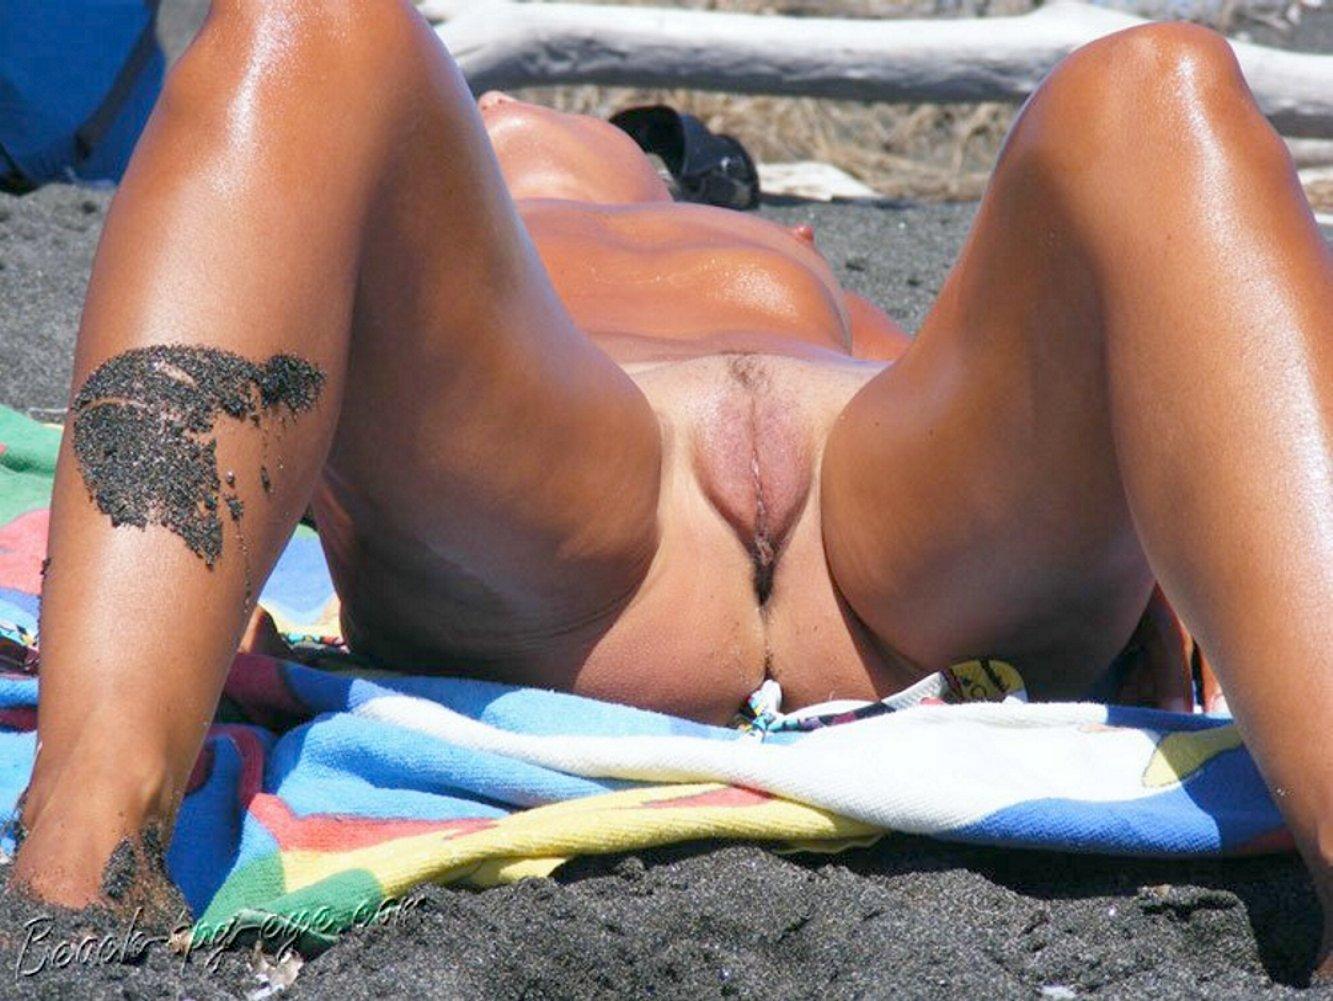 Girls bikini vagina slip